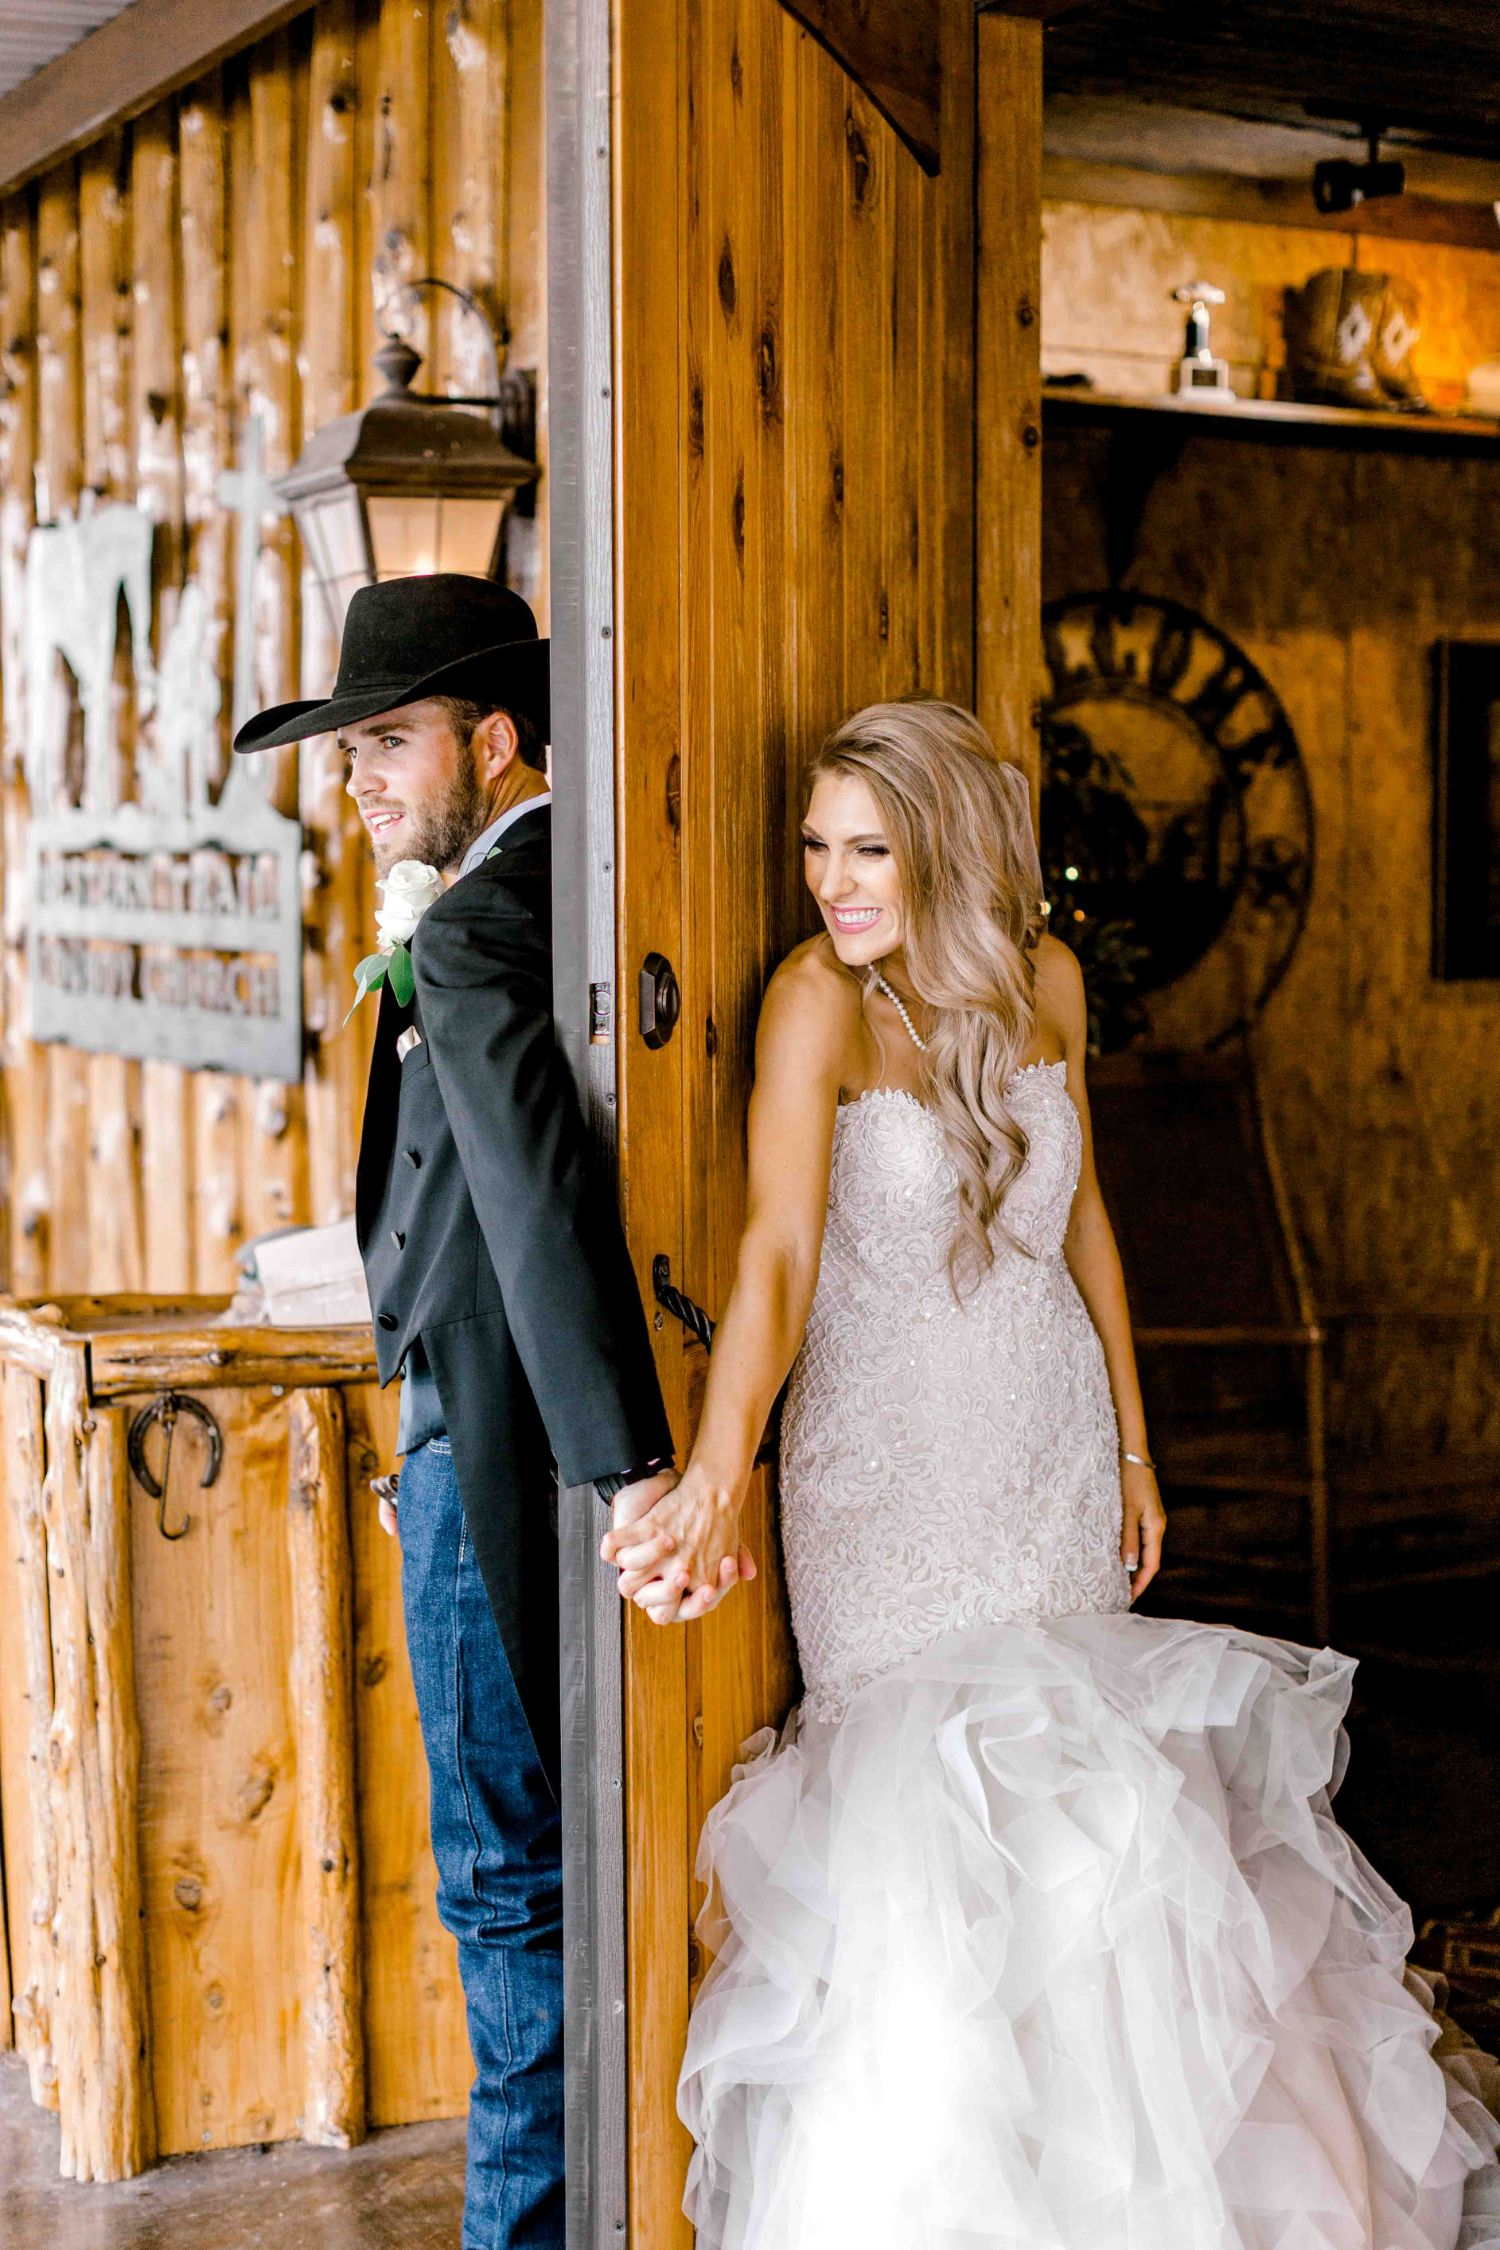 wichita-falls-wedding-katelyn-colten-vernon-texas-19.jpg